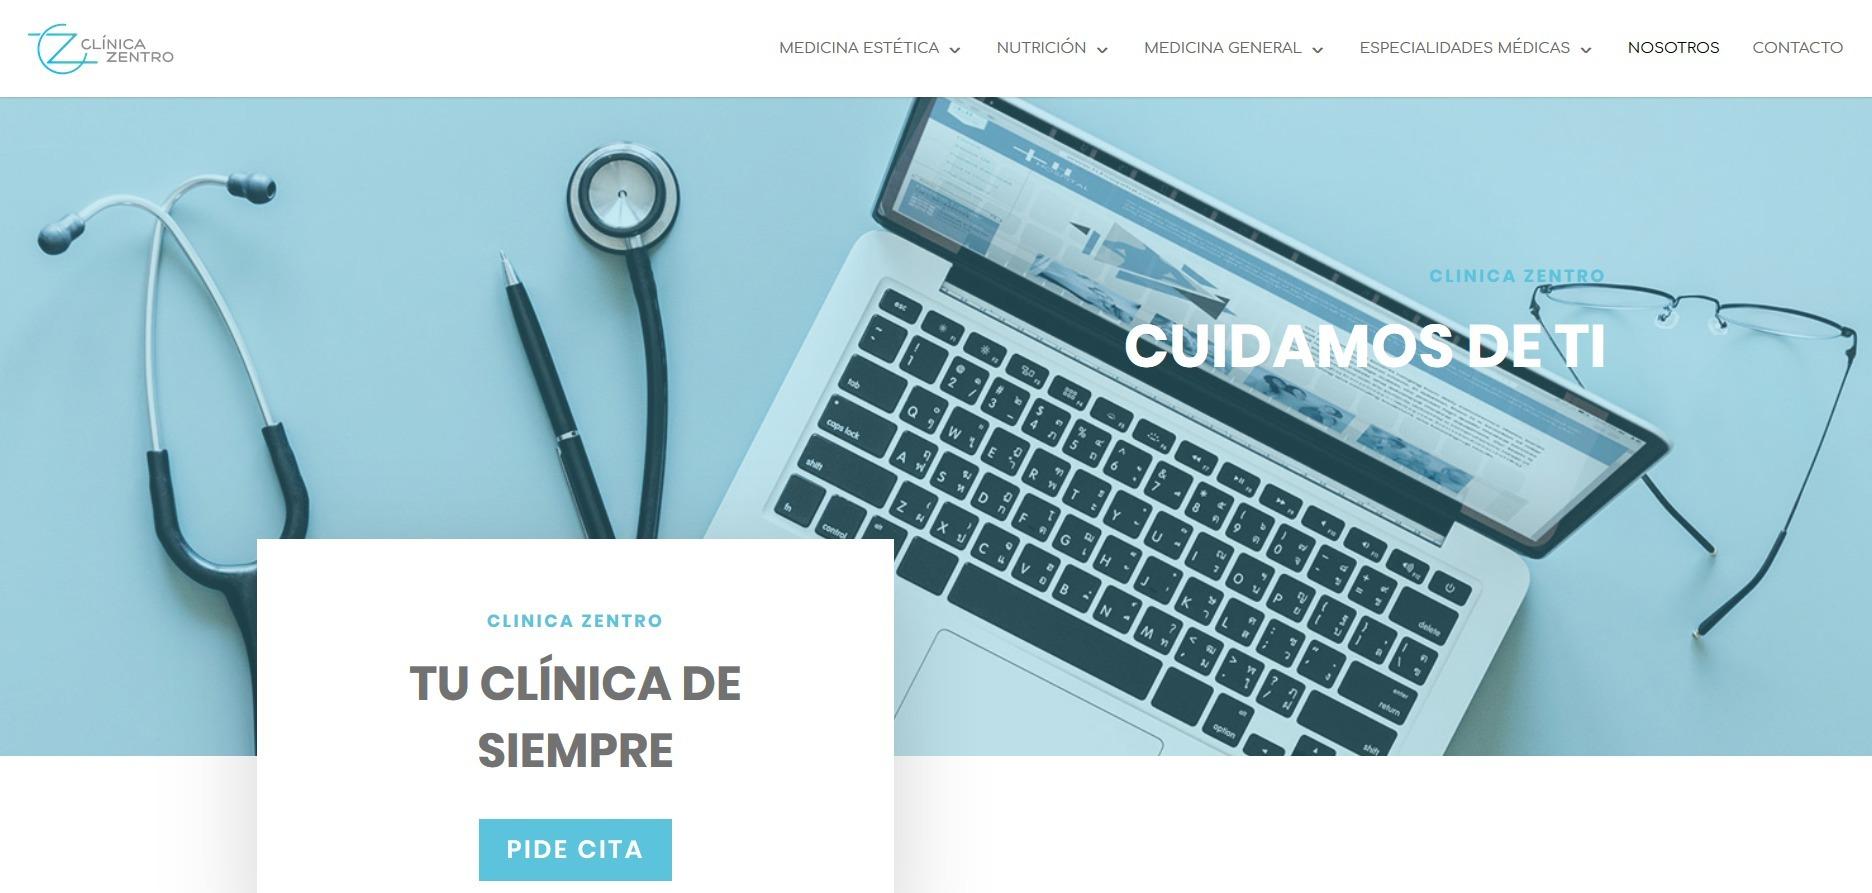 ClínicaZentro (@clinicazentro) Cover Image